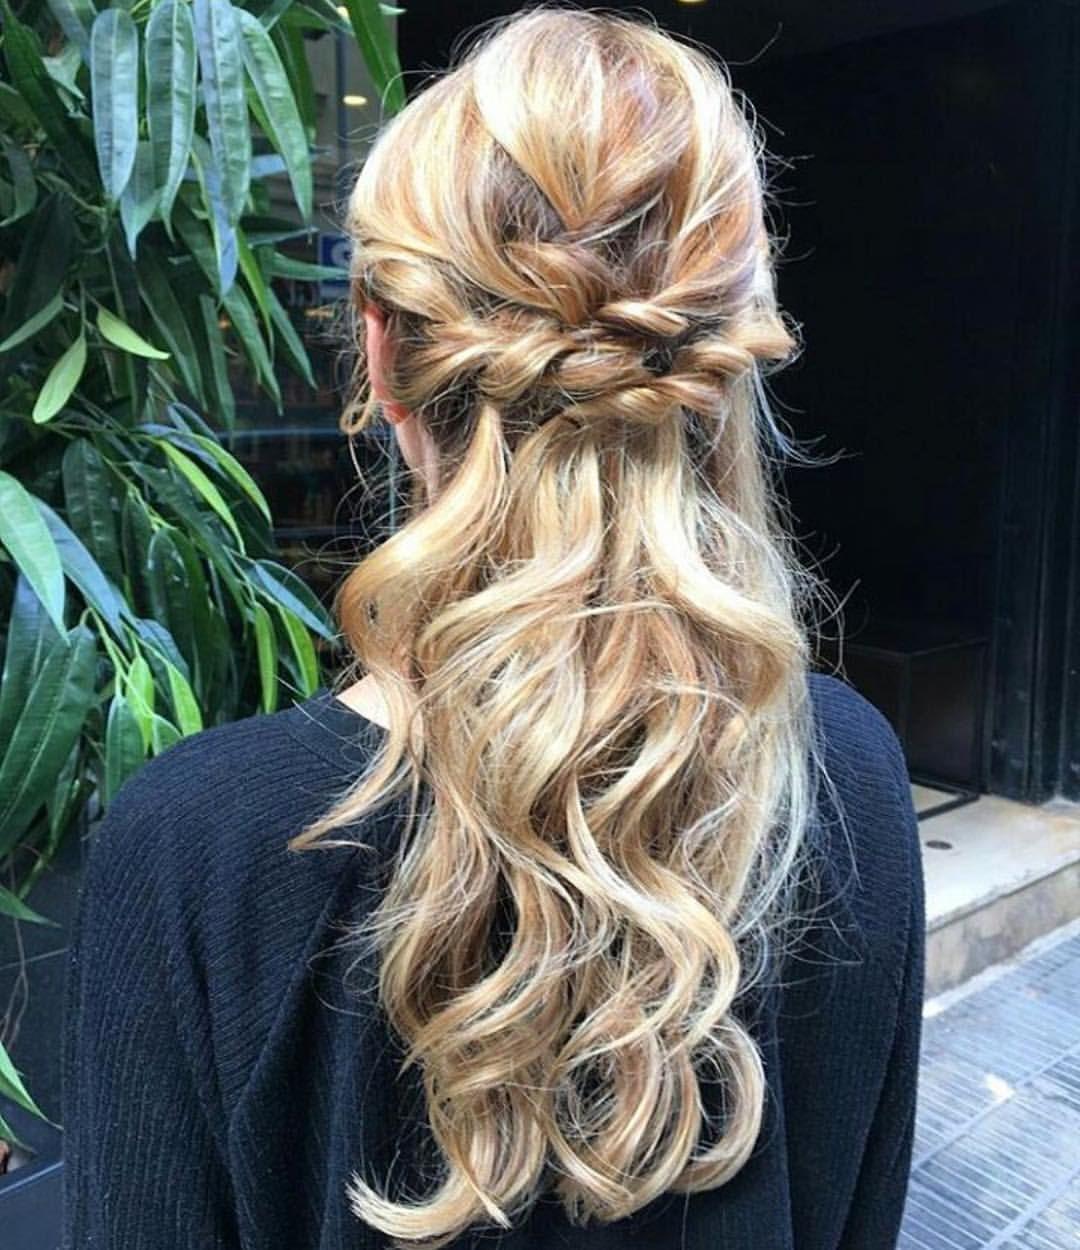 Épinglé sur hair